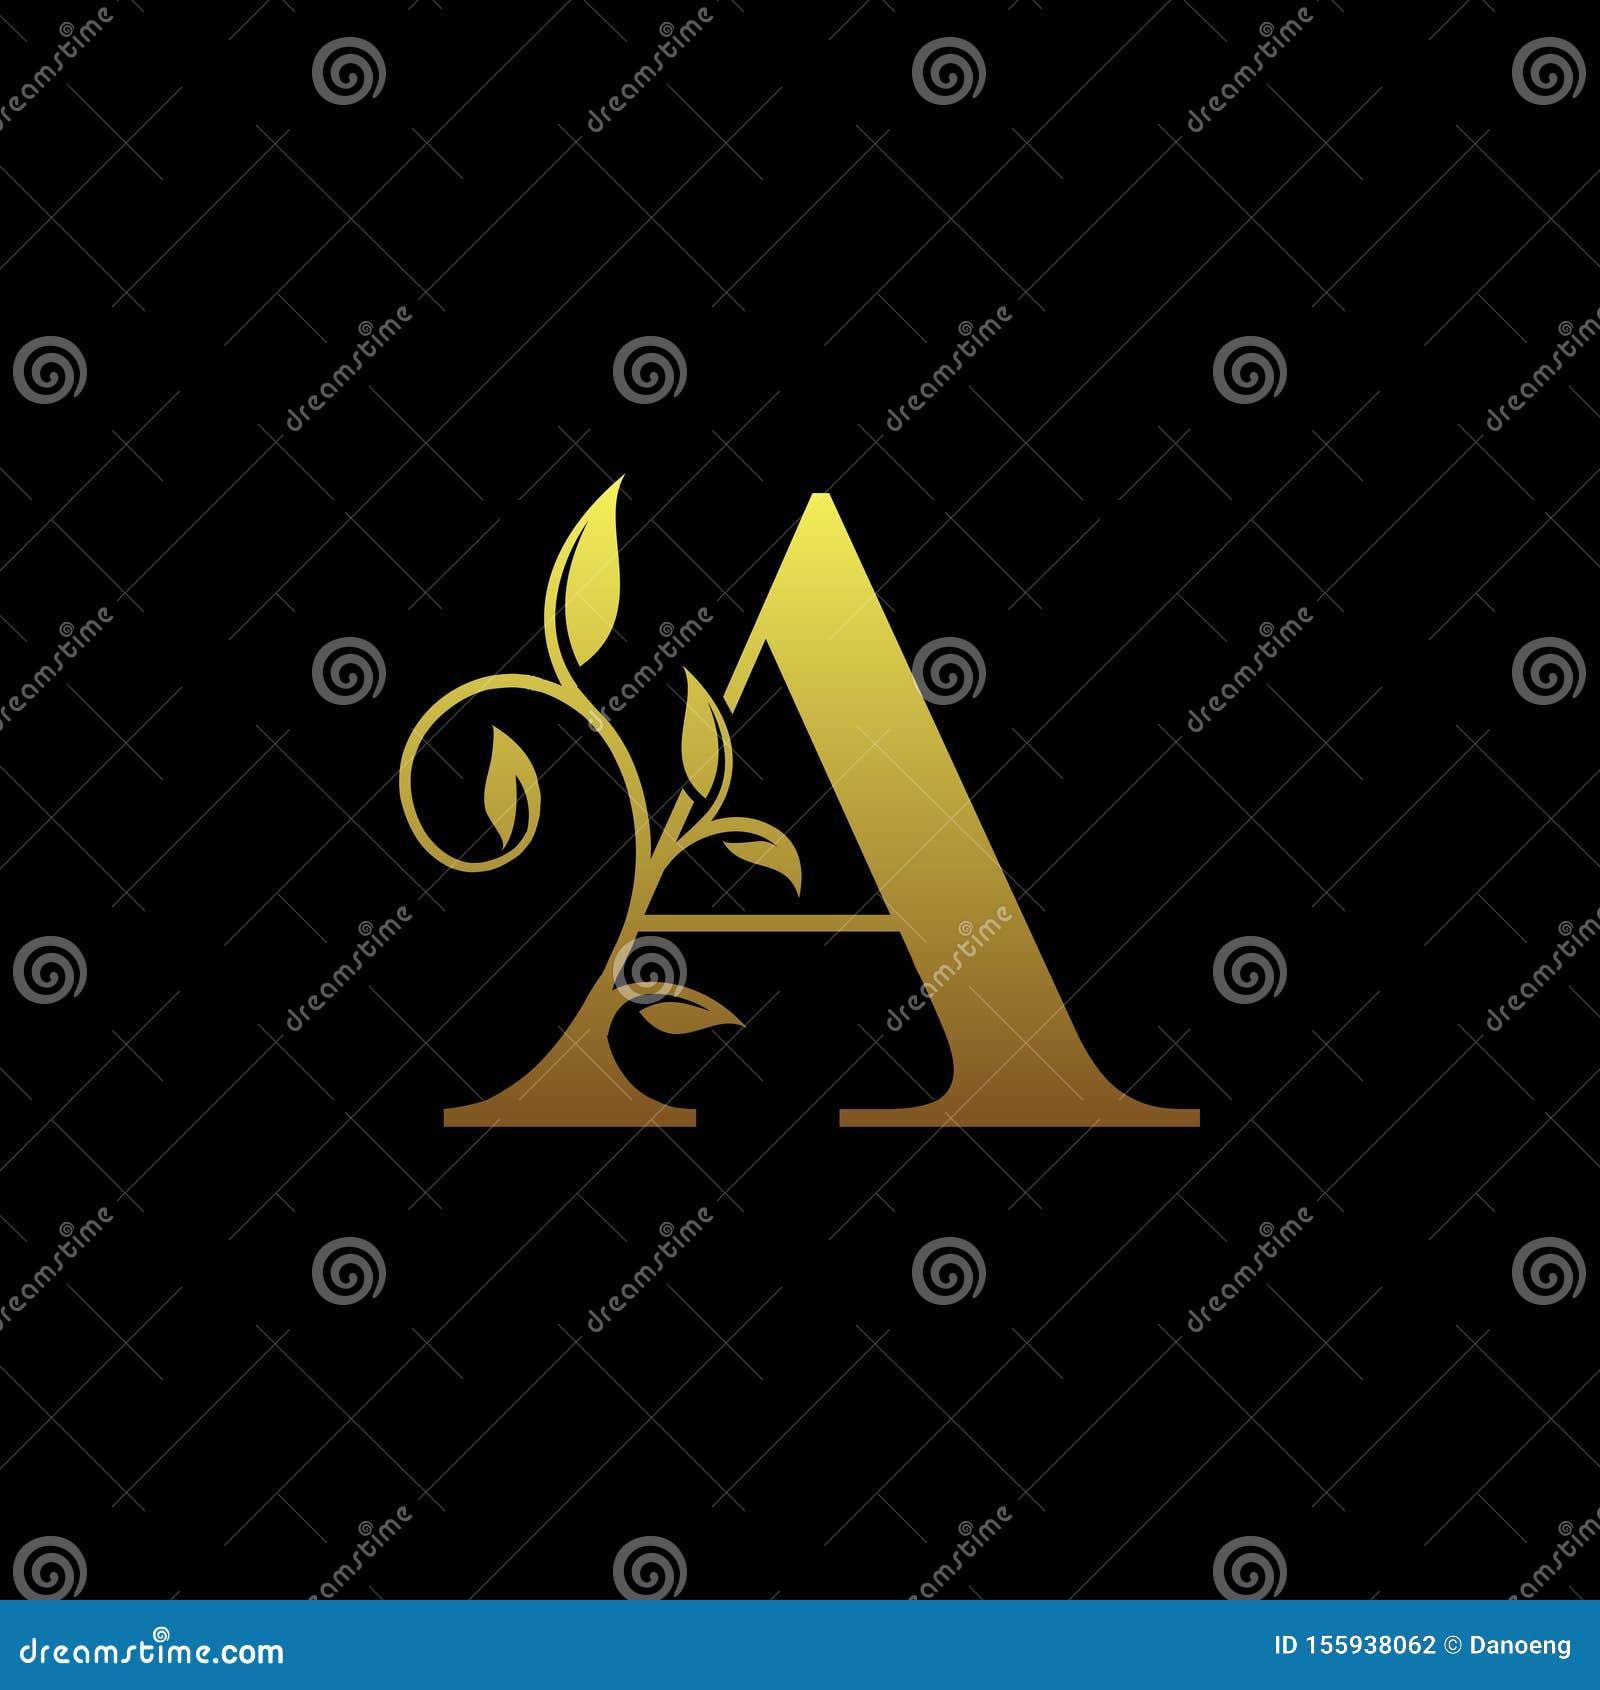 Feminine Floral Letter Logo Template:  Letter L. Luxury Logo Template Flourishes Calligraphic